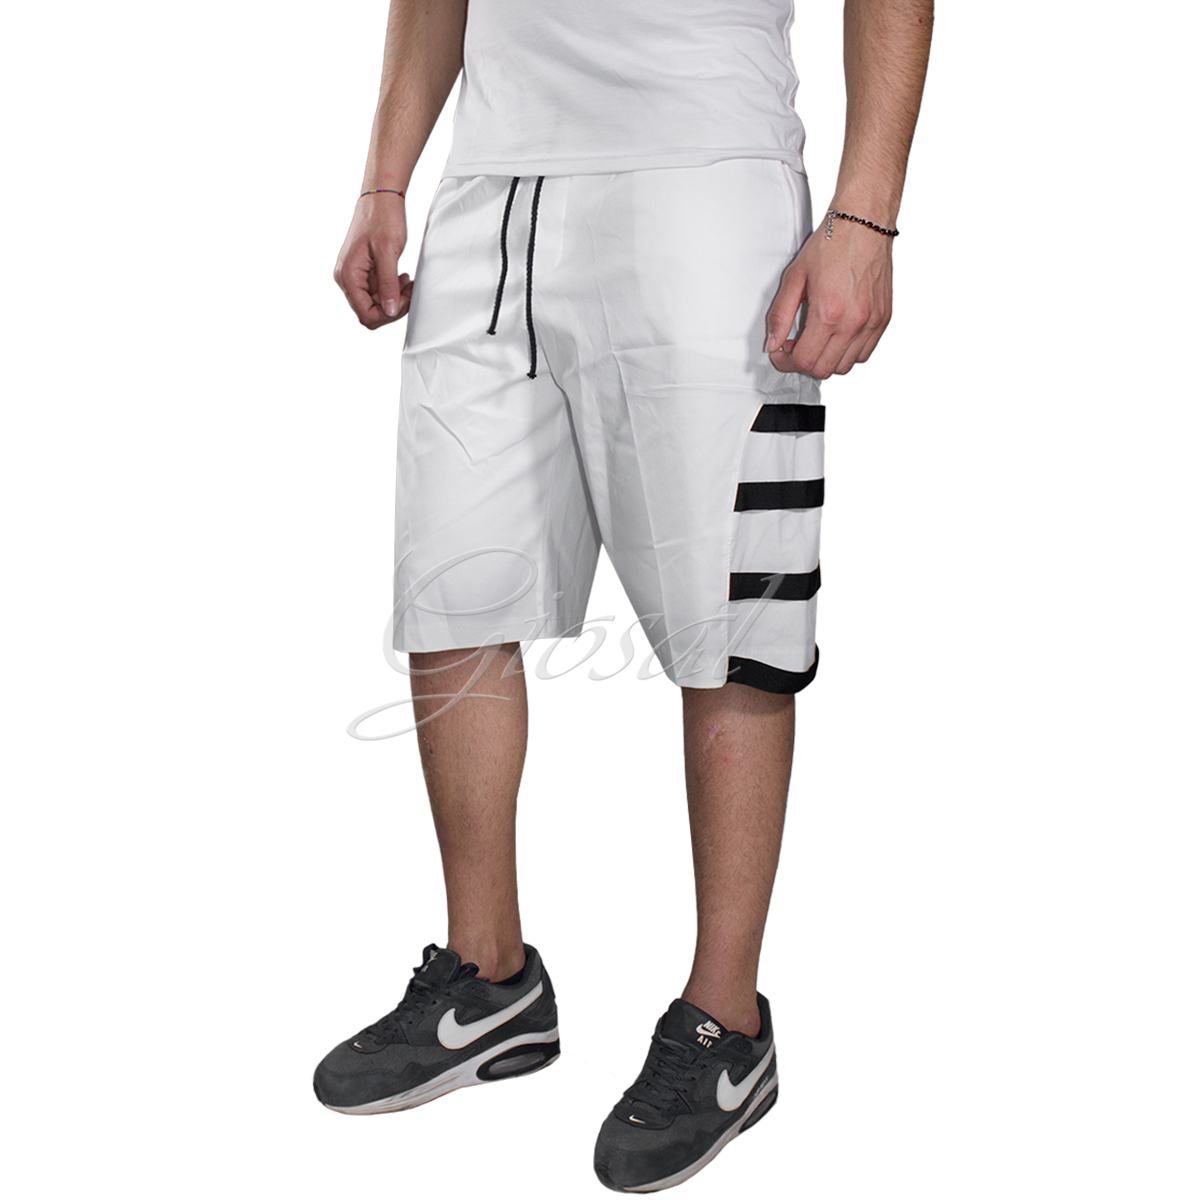 Cortos Detalles Rayas Pantalones Bermudas Vario Chándal Hombre Algodón Liso Color De Lateral K5uTF1cJl3